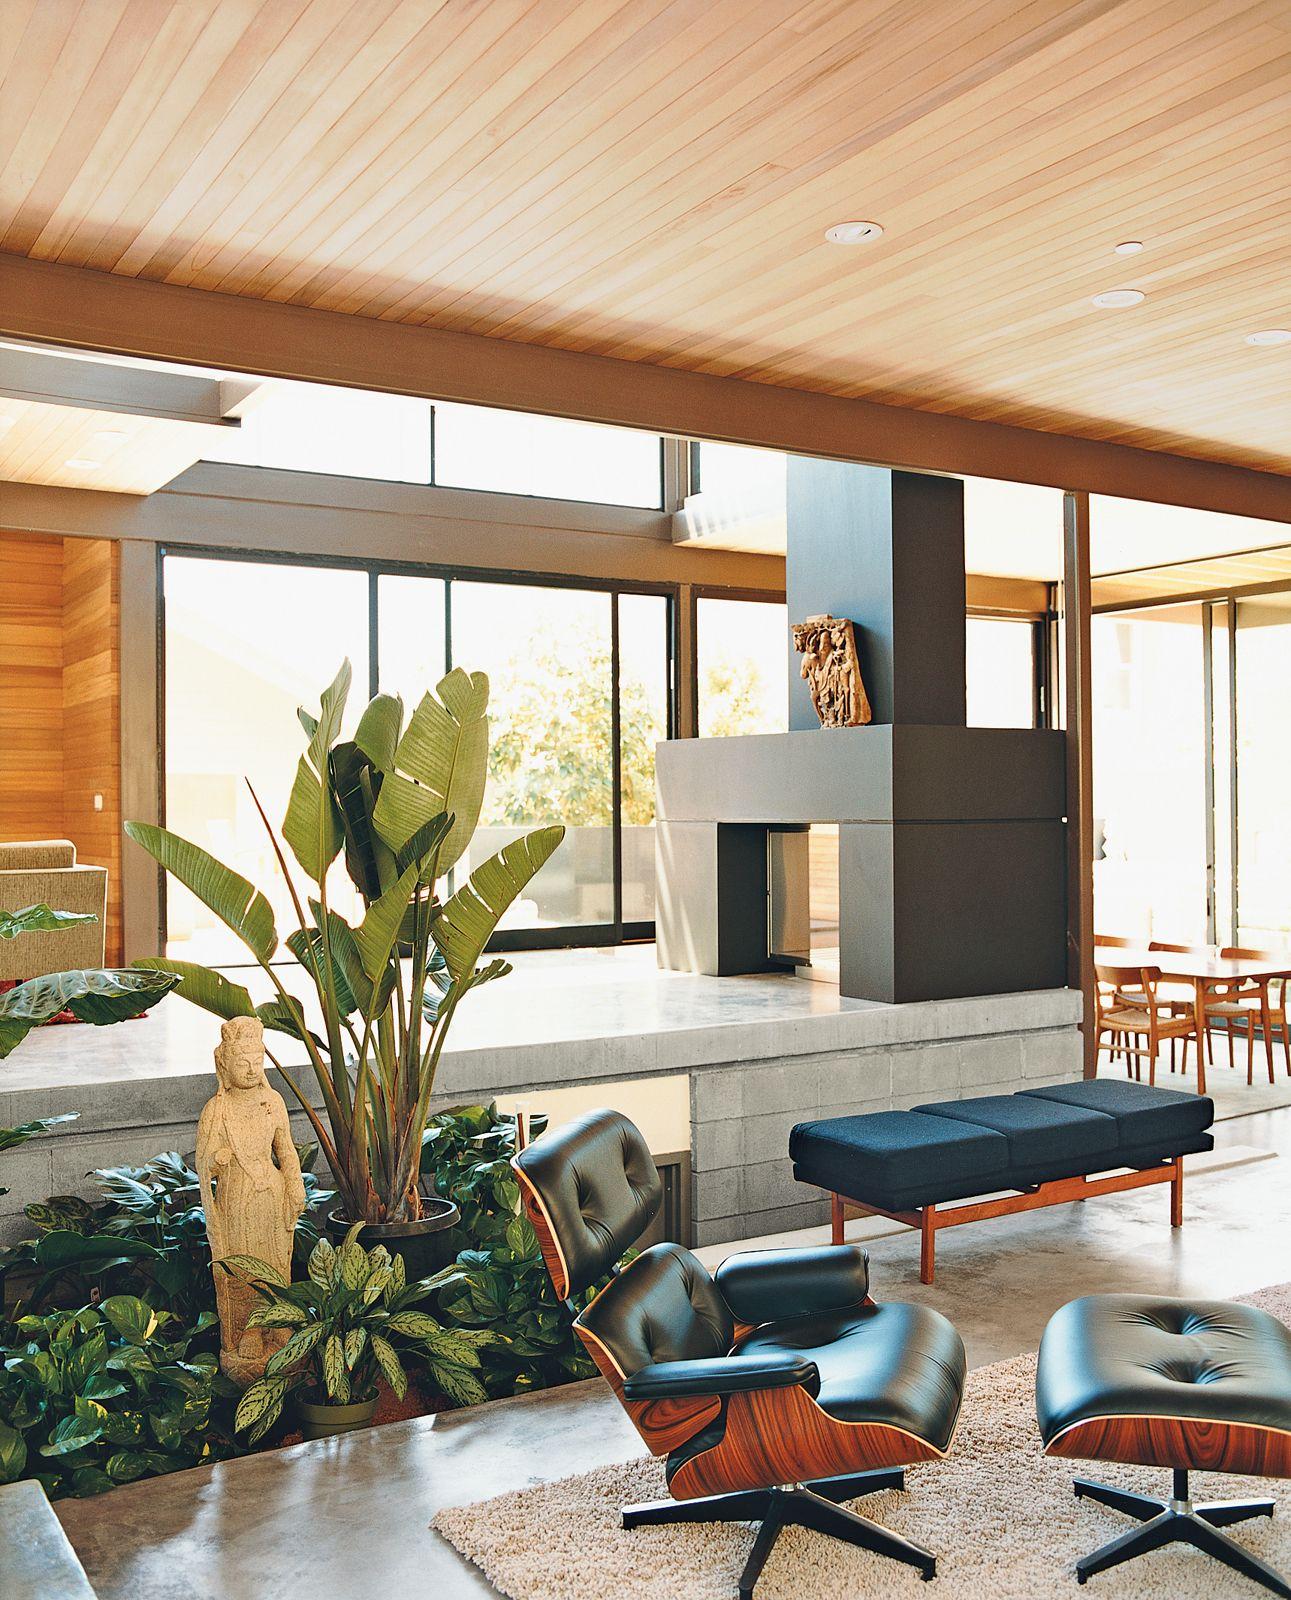 Leeding The Way Mid Century Modern Interiors Mid Century Modern House Mid Century Modern Living